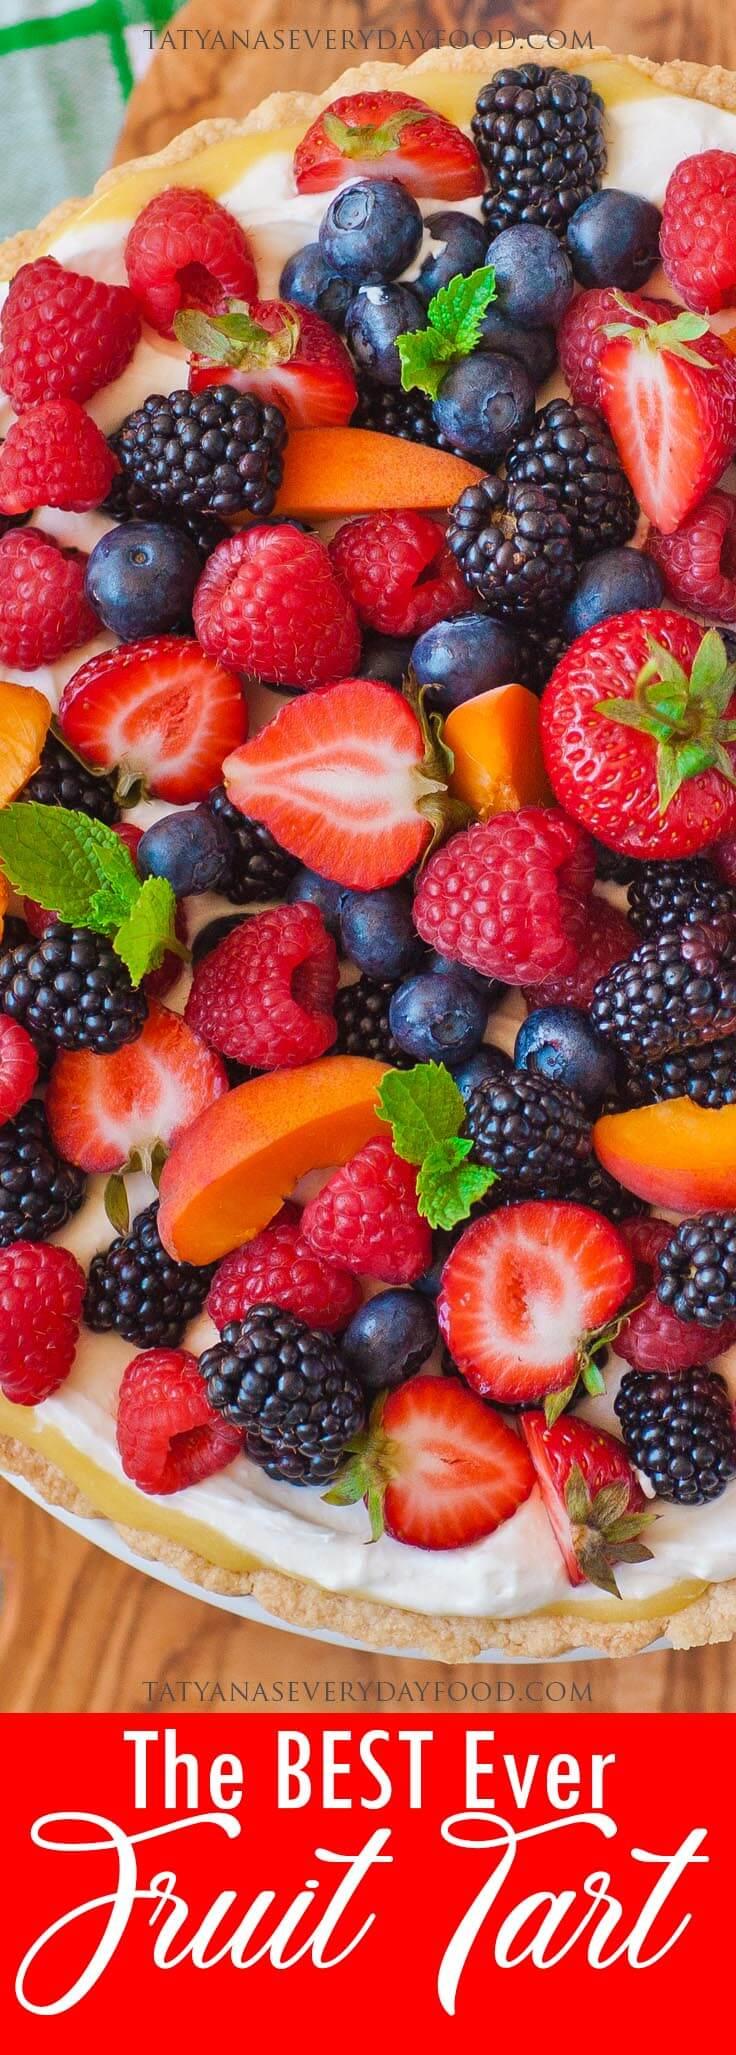 The BEST Ever Fruit Tart video recipe